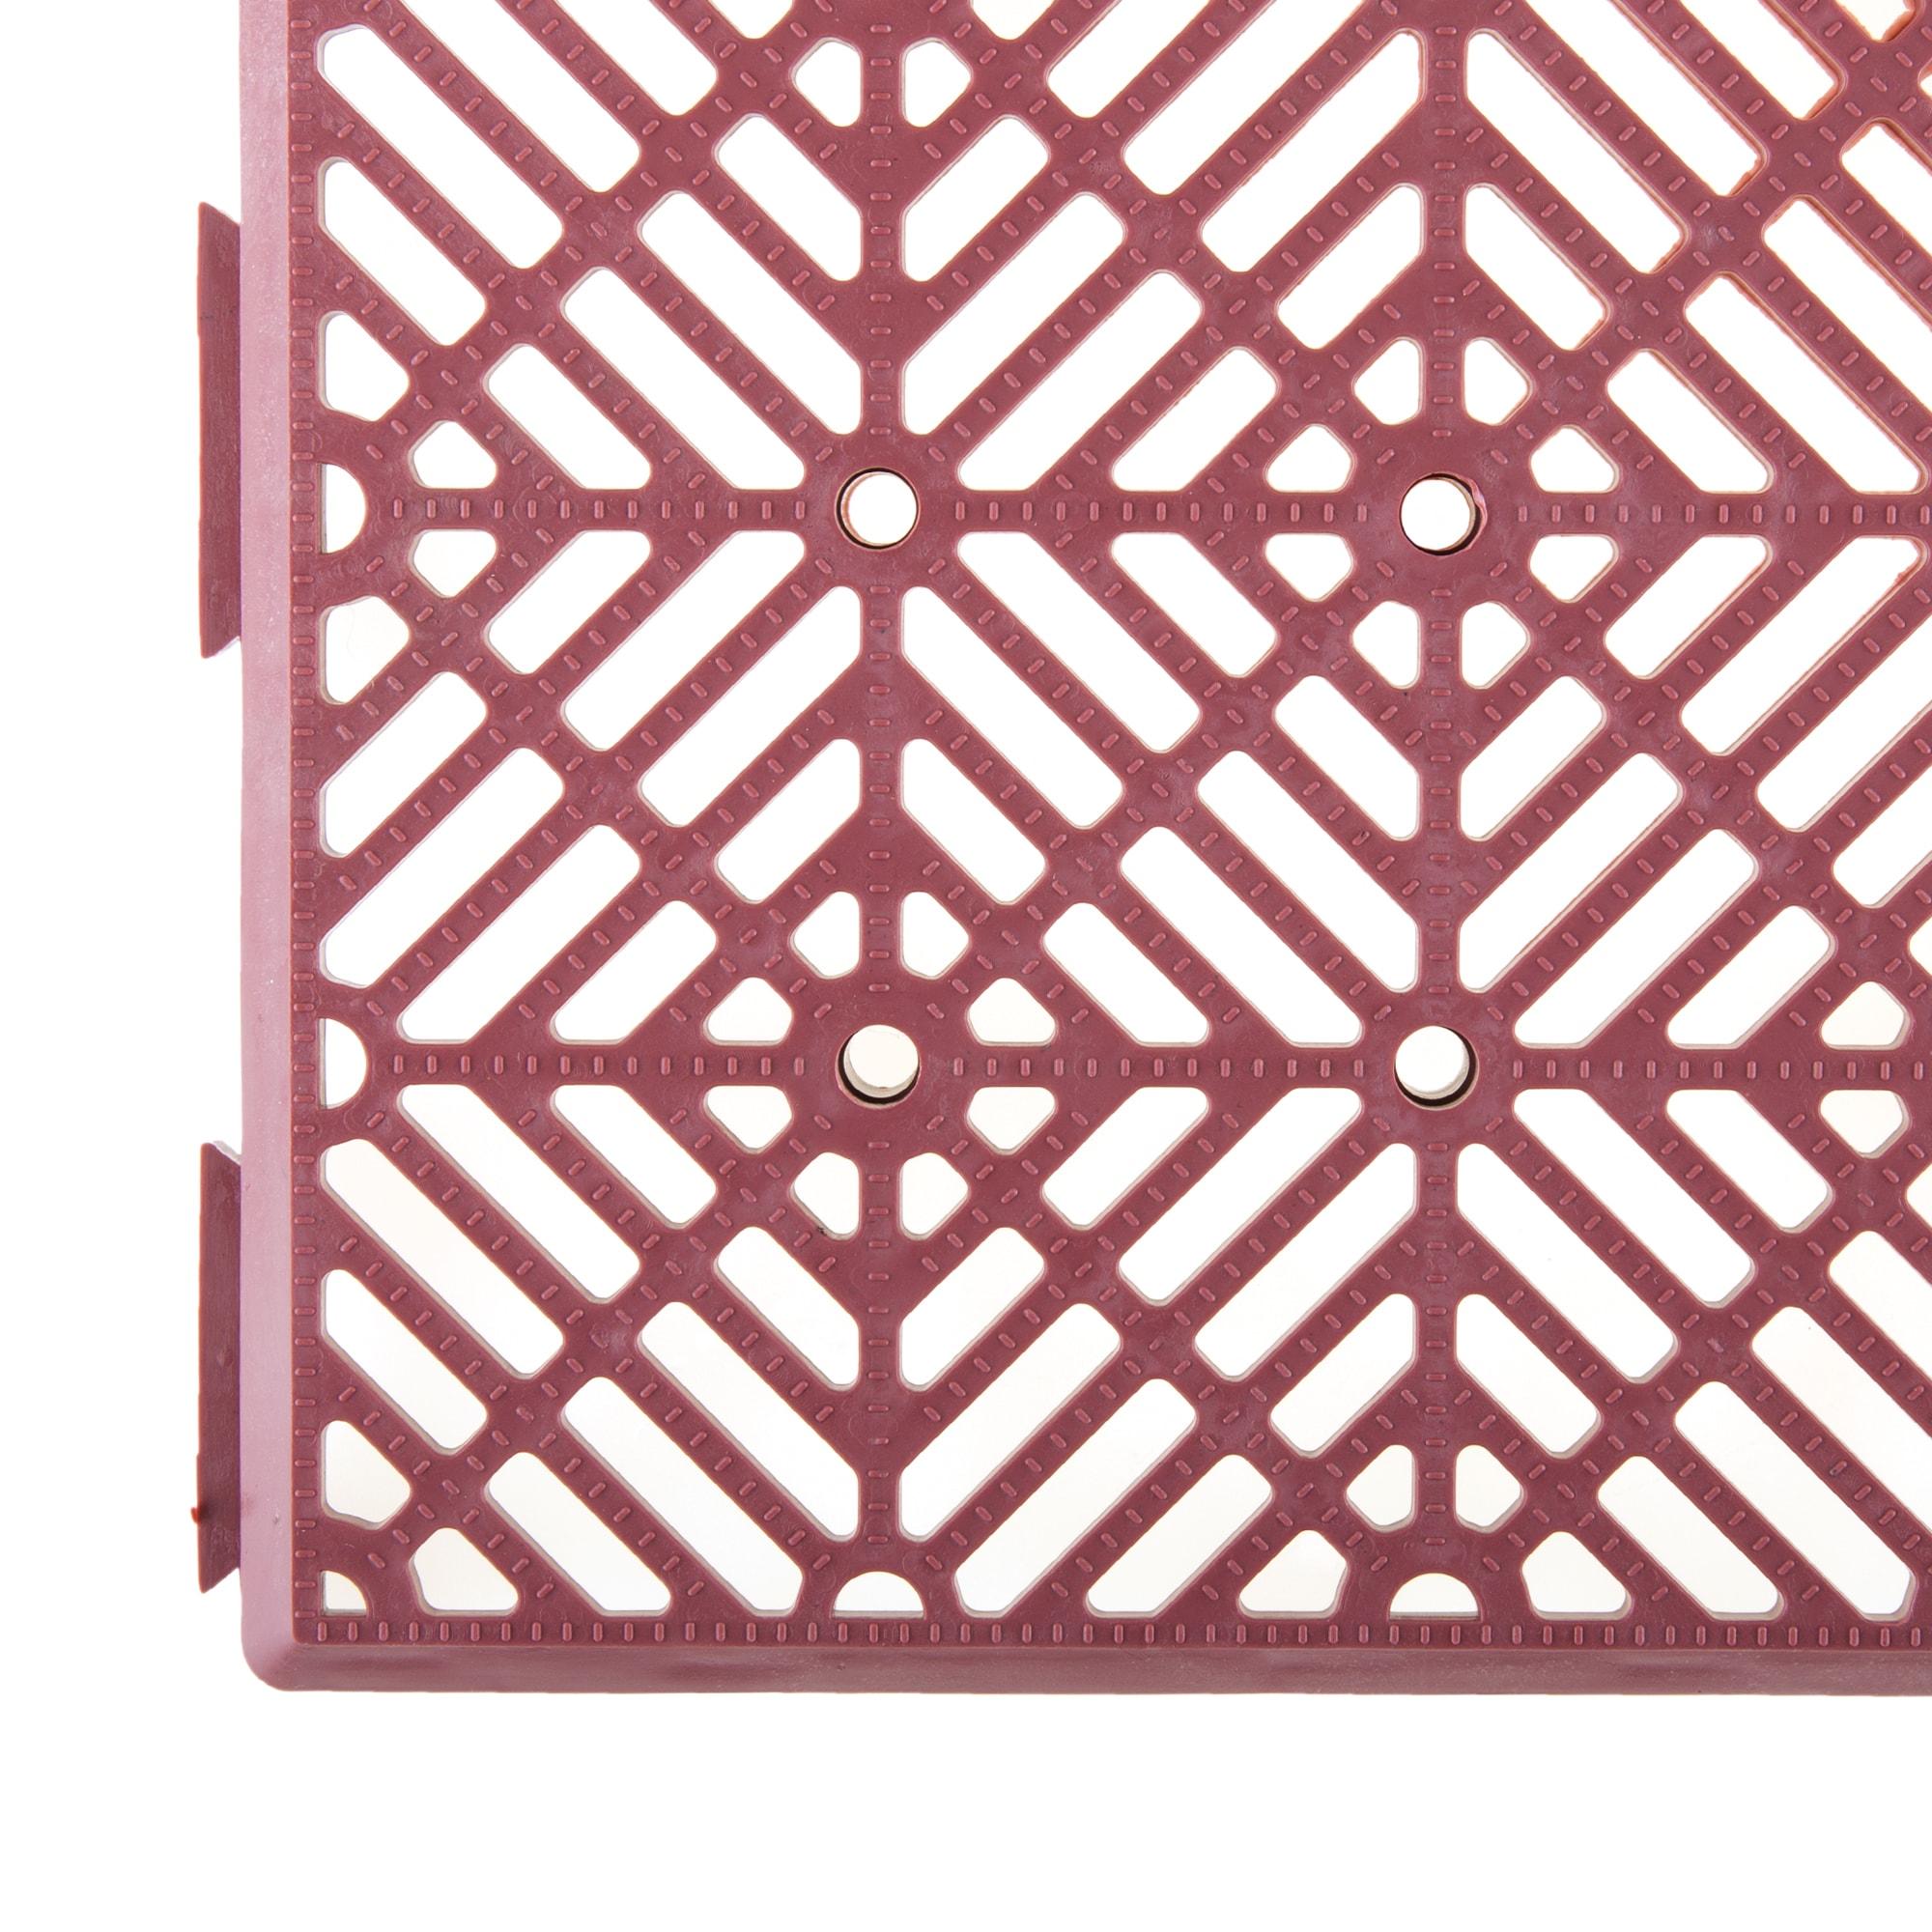 Pure Garden Interlocking Patio Deck or Garage Floor Tiles 12 x